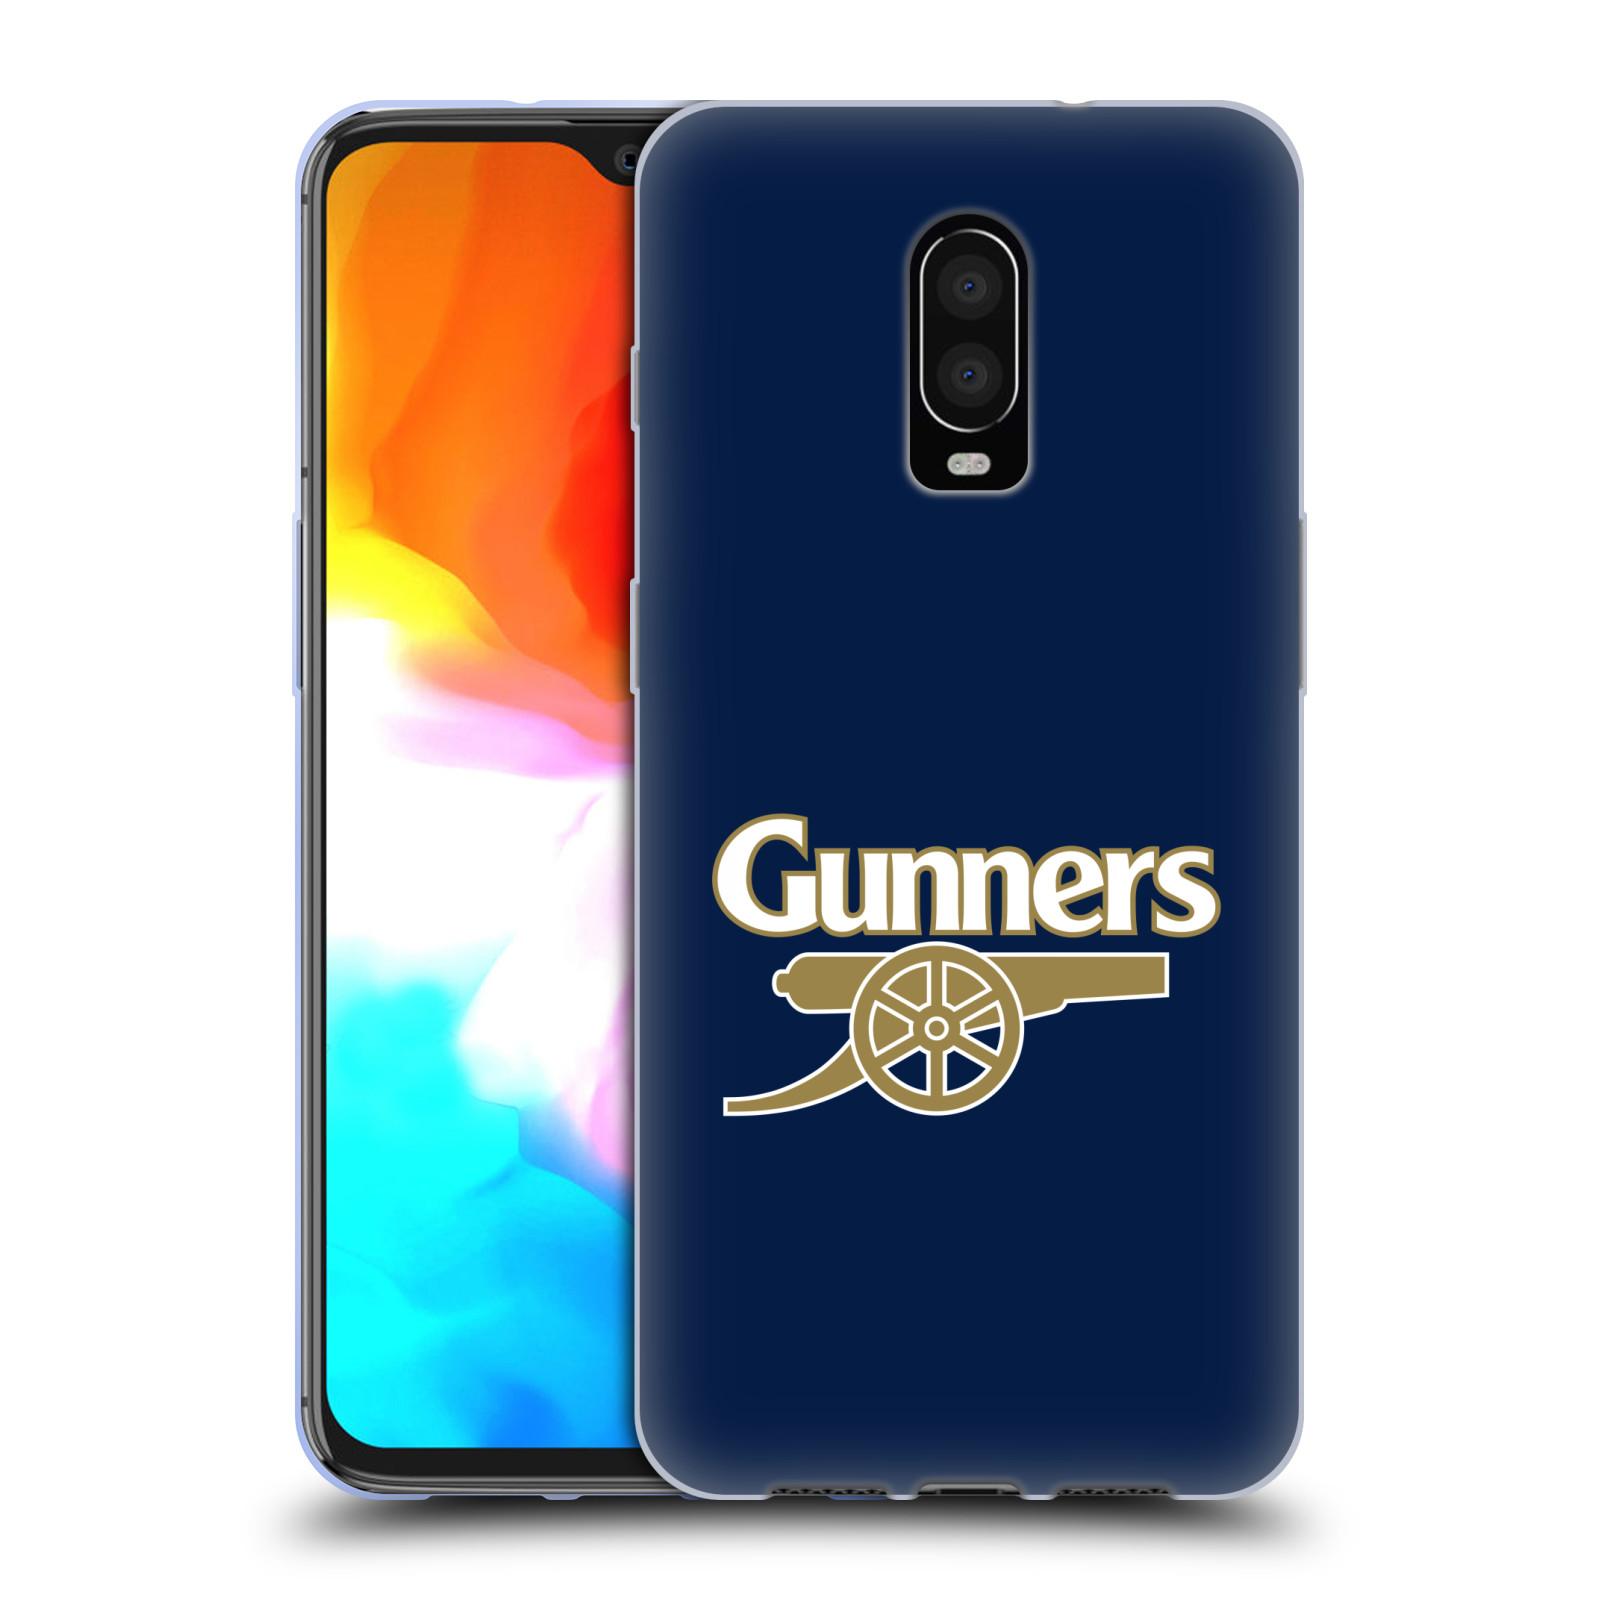 Silikonové pouzdro na mobil OnePlus 6T - Head Case - Arsenal FC - Gunners